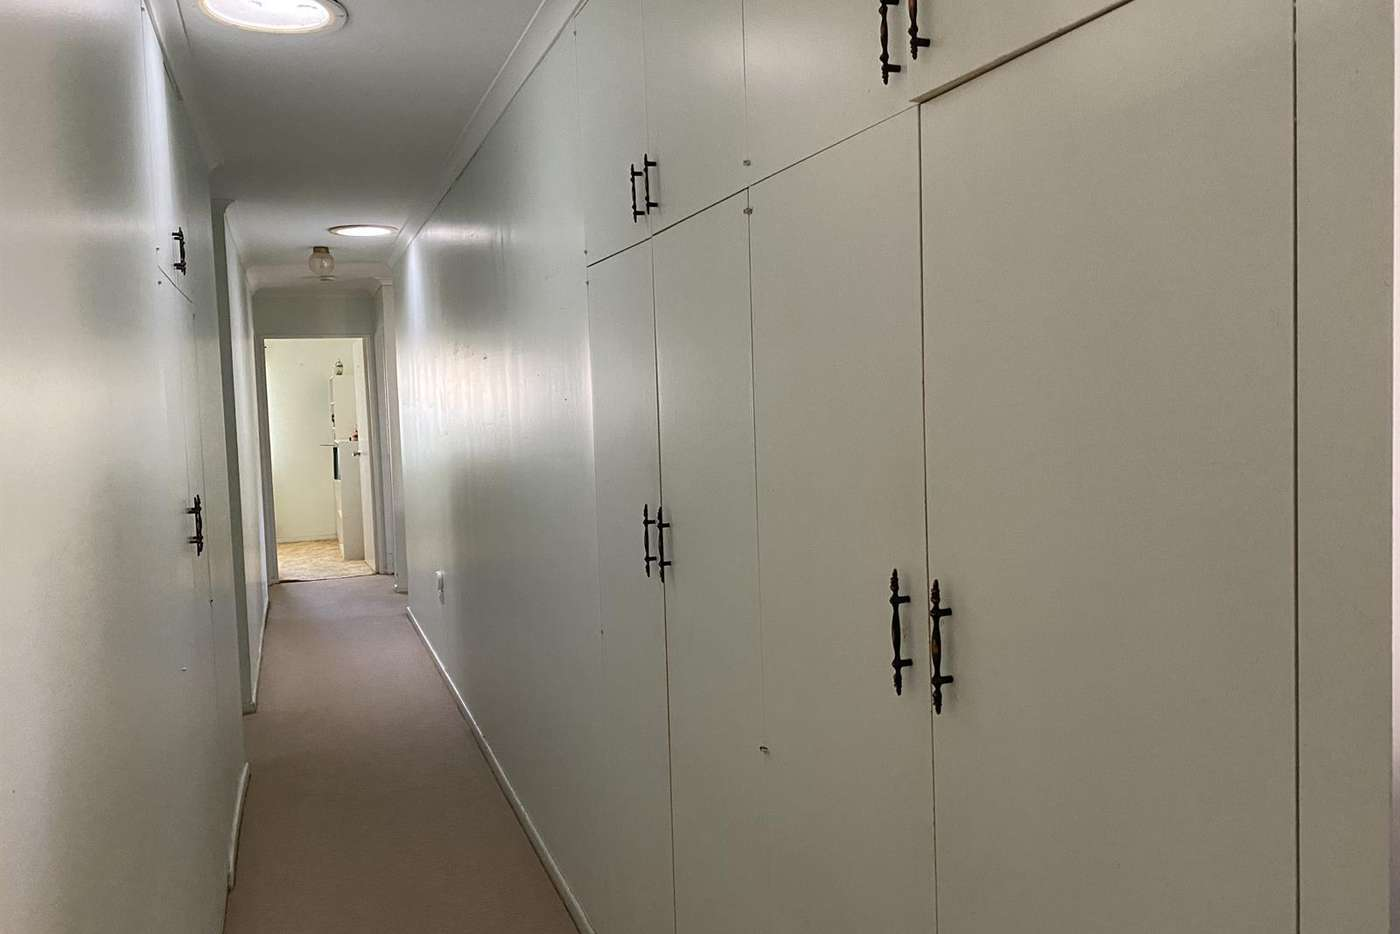 Seventh view of Homely house listing, 94 Burnett St, Nanango QLD 4615